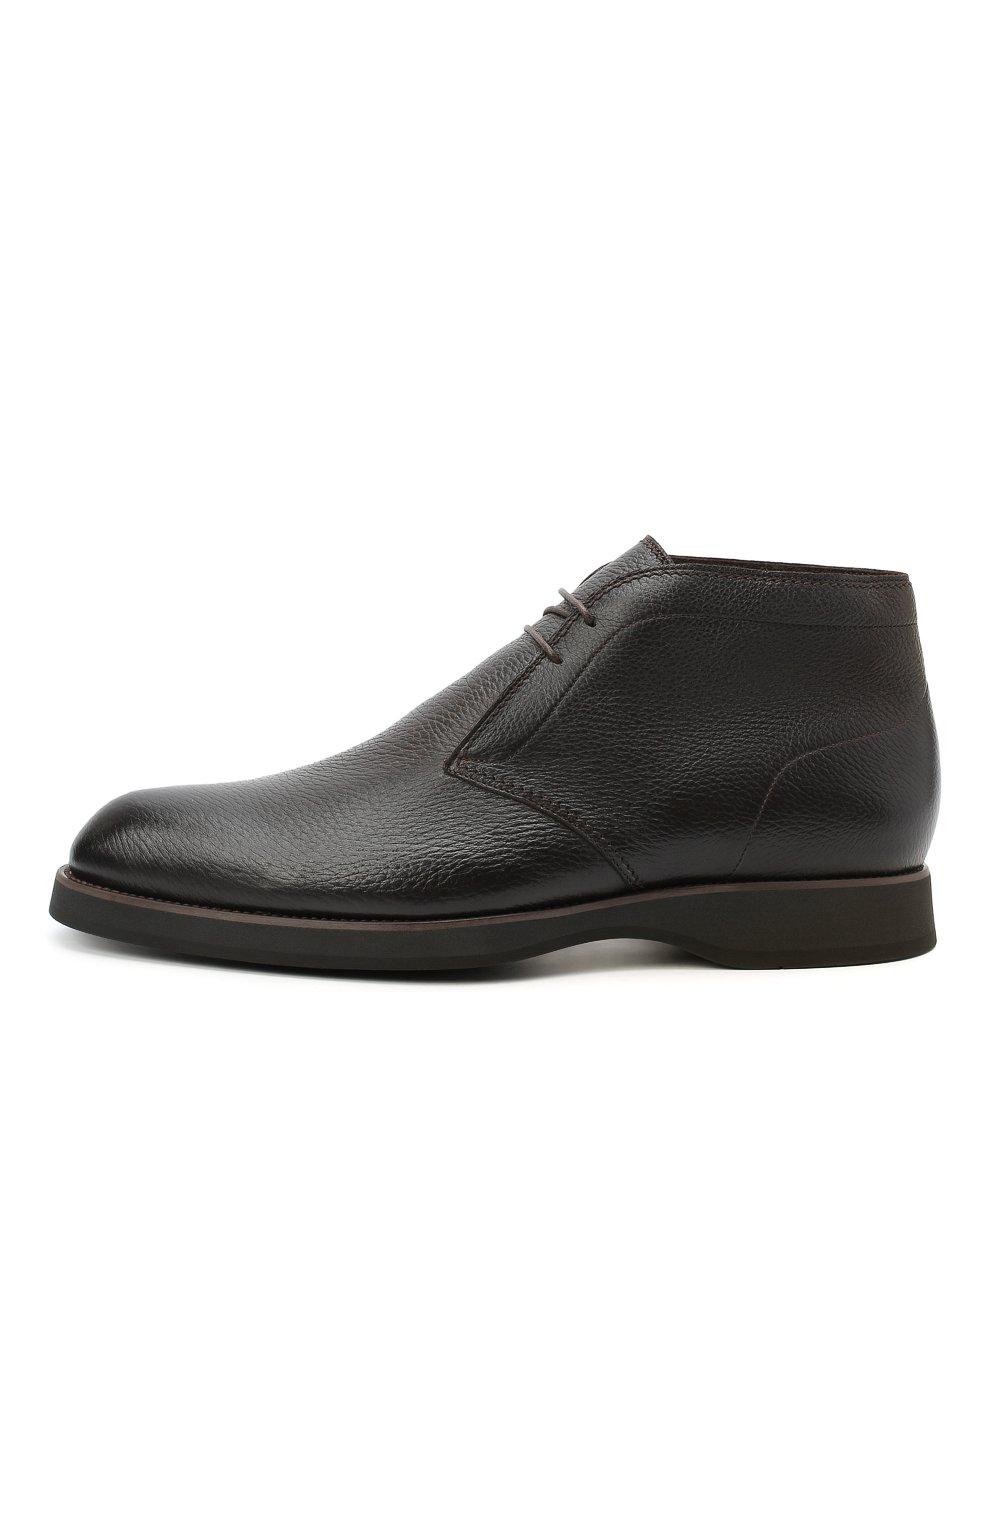 Мужские кожаные ботинки BRIONI темно-коричневого цвета, арт. QQC30L/09712 | Фото 3